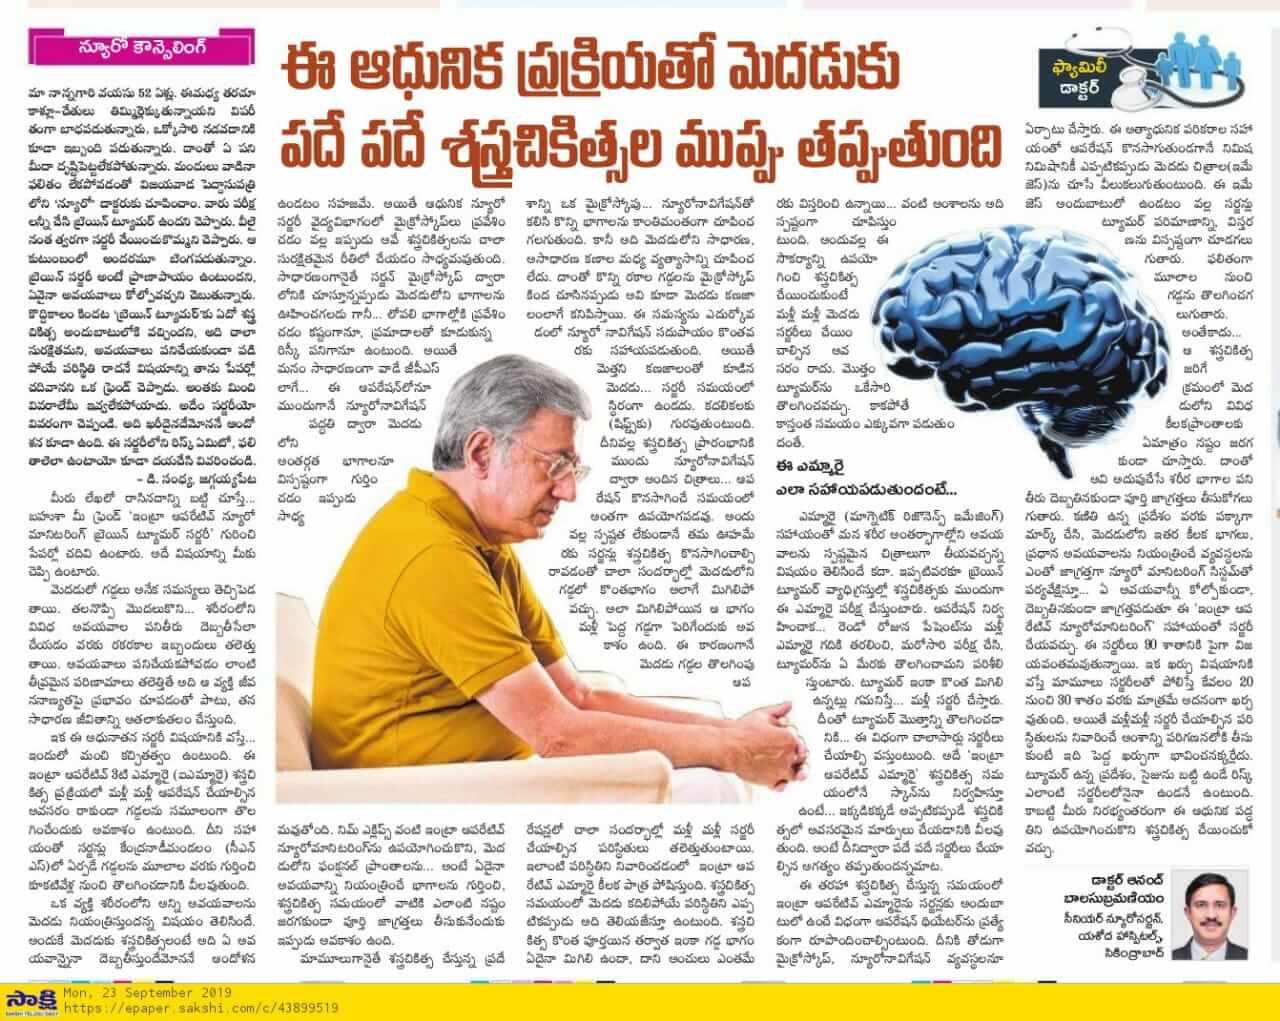 Brain surgeries with IMRI - Dr Anand Balasubramaniyam